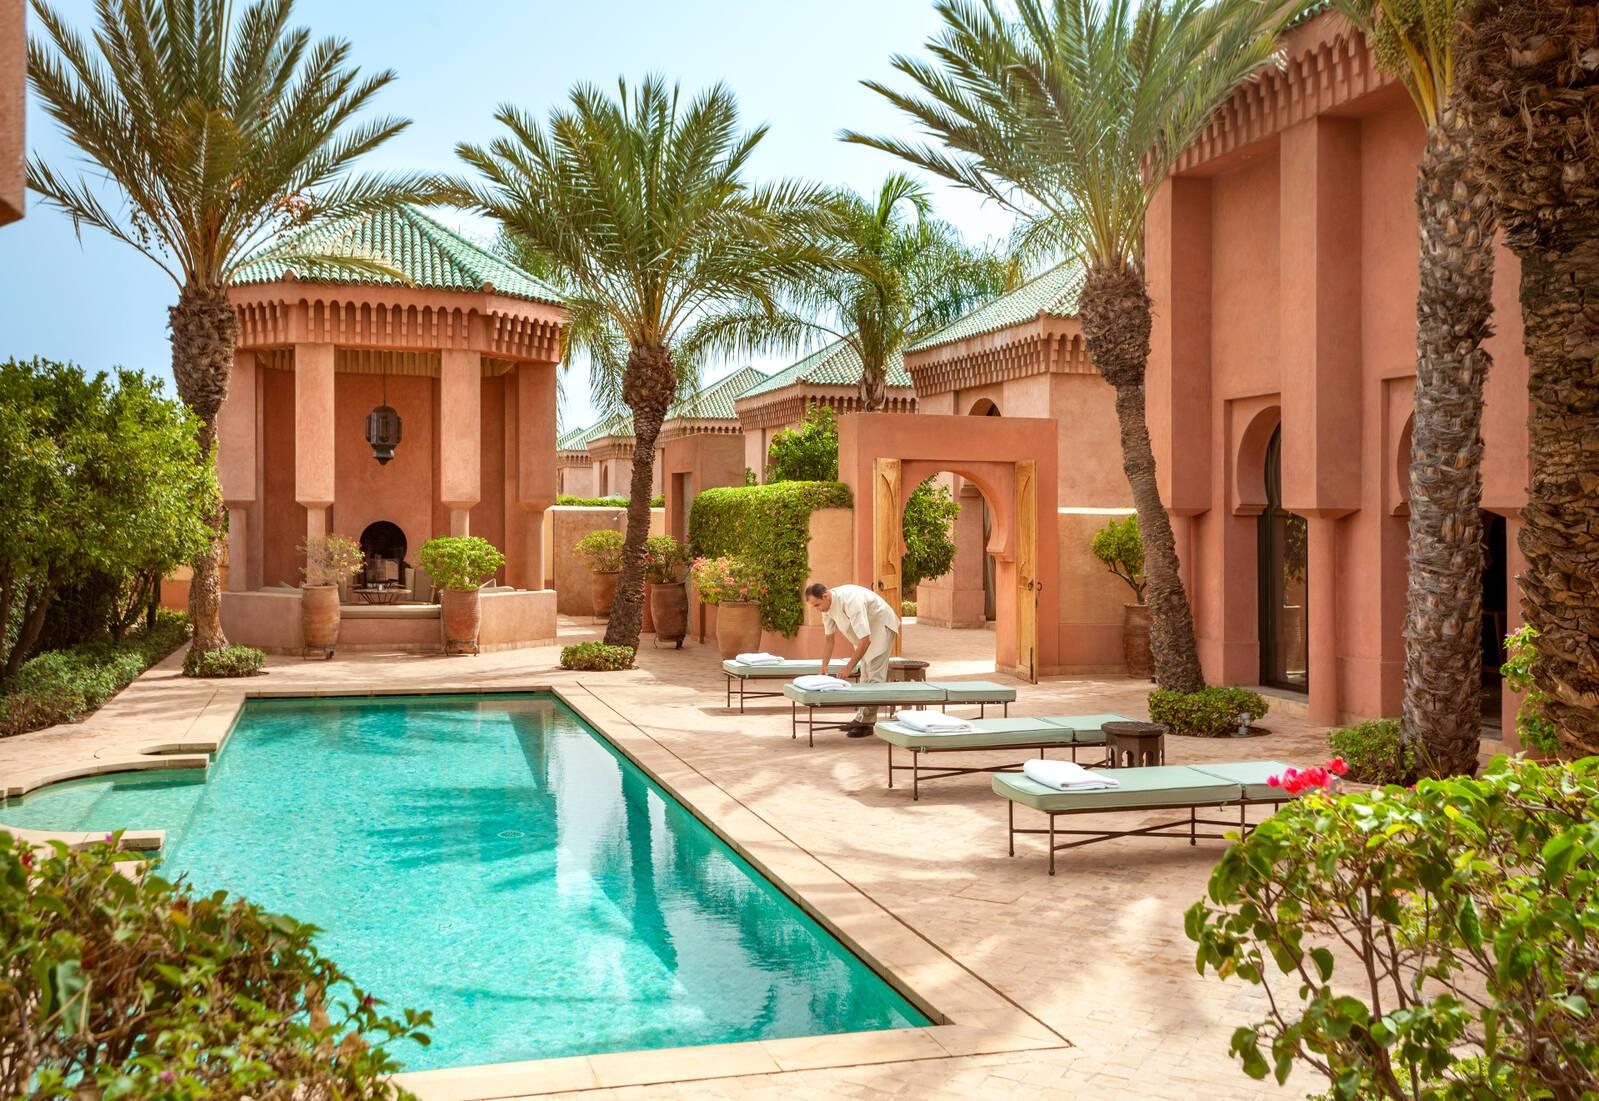 Amanjena Al Hamra Piscine Jardins Marrakech